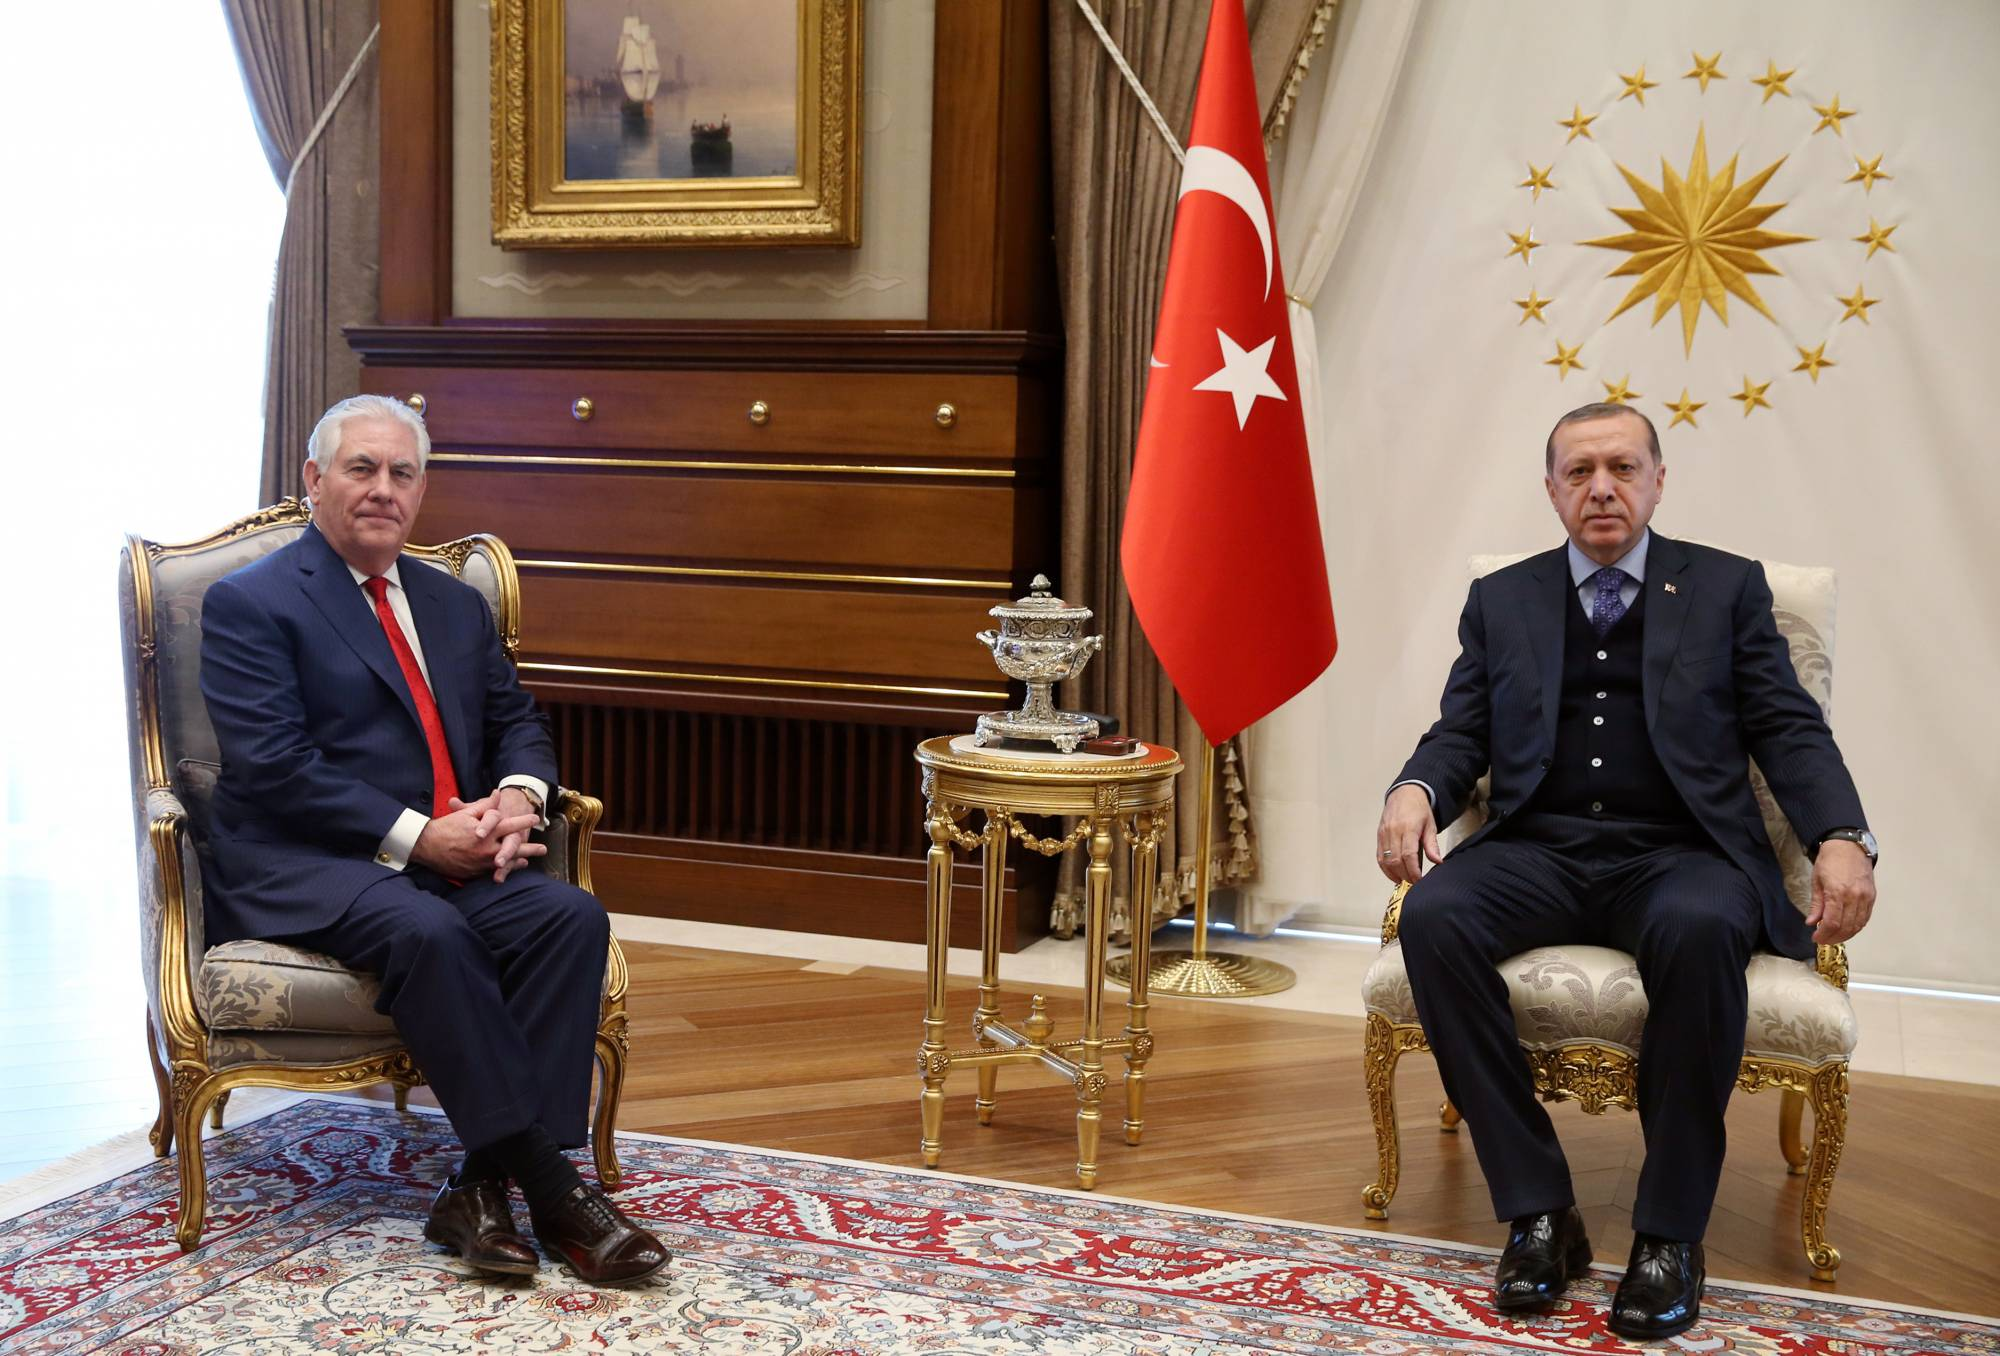 Belgium warns against violence during Turkey referendum vote